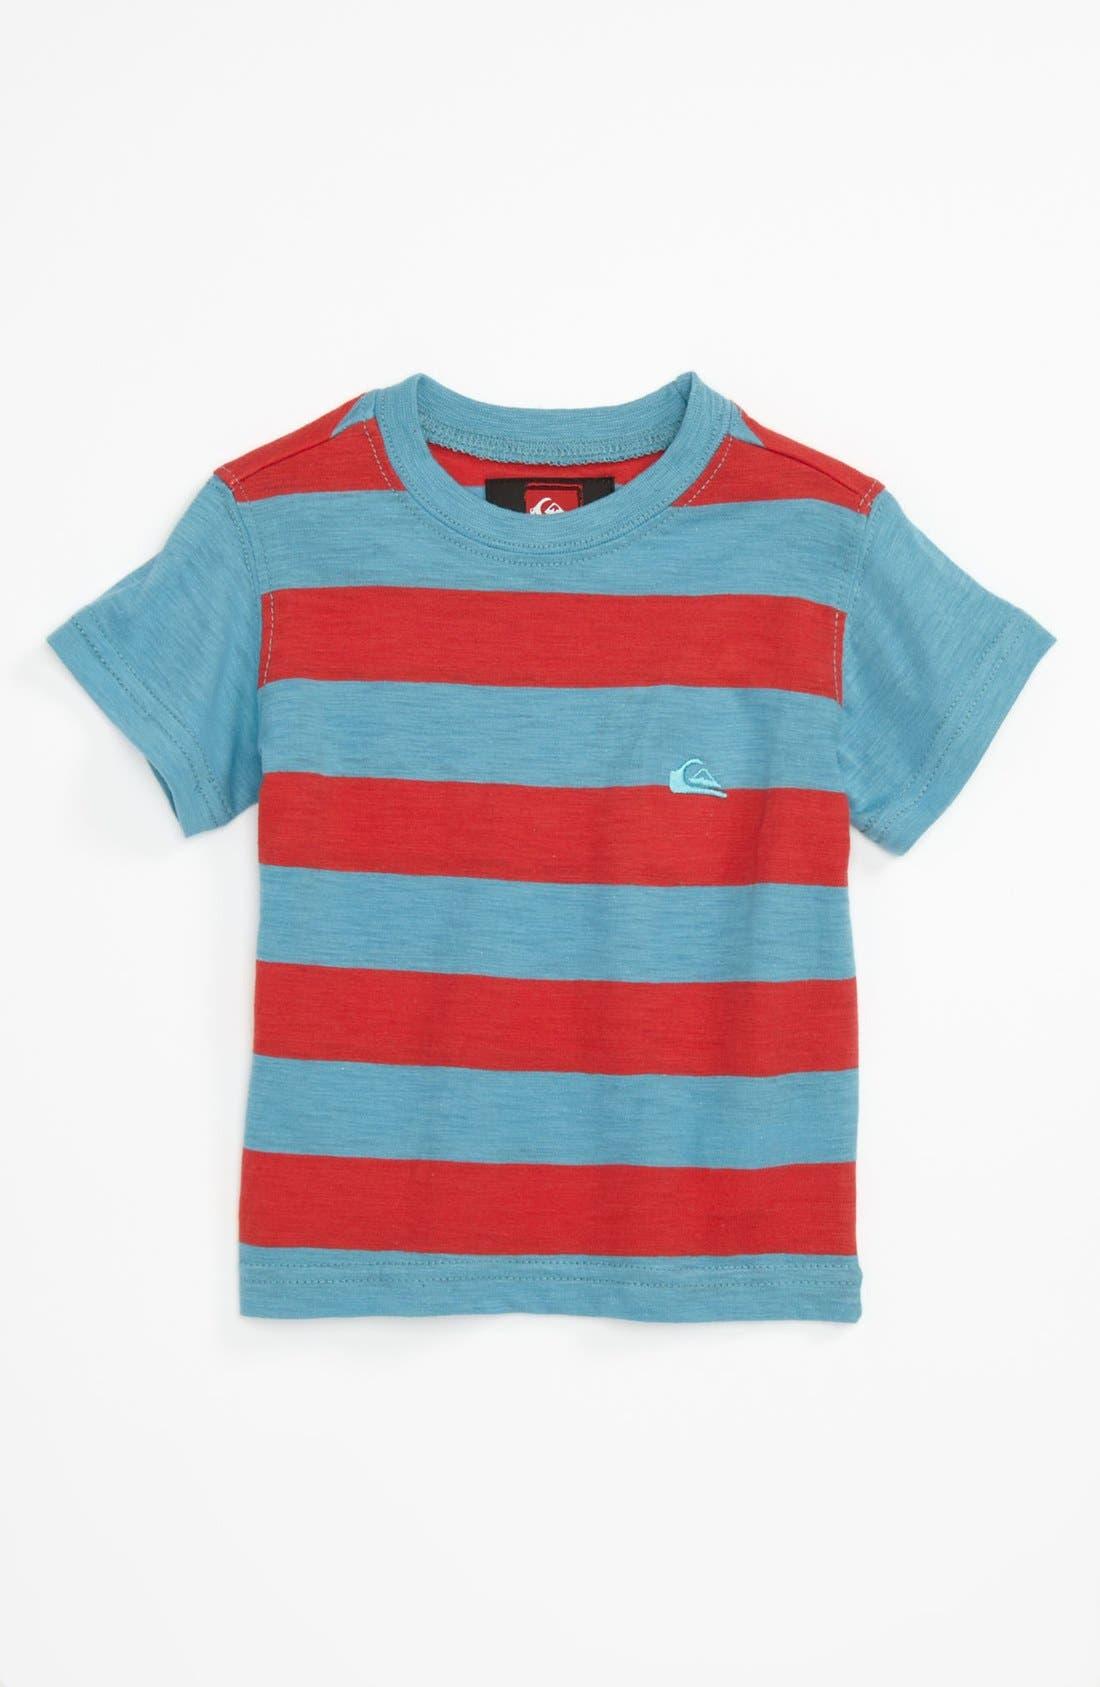 Alternate Image 1 Selected - Quiksilver 'Zebra Juice' T-Shirt (Baby)